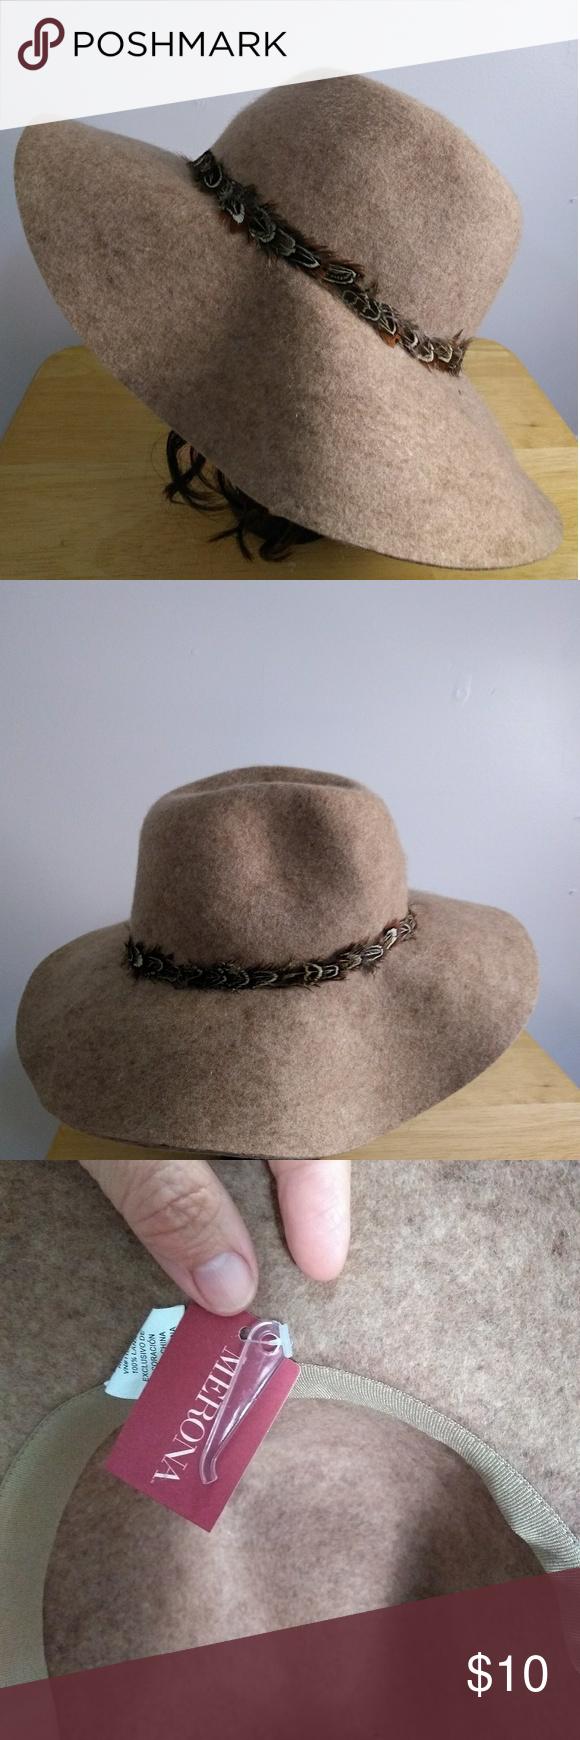 357b073350281 I just added this listing on Poshmark  New Target Brown Feather Wool Floppy  Hippy Hap.  shopmycloset  poshmark  fashion  shopping  style  forsale   Missoni ...